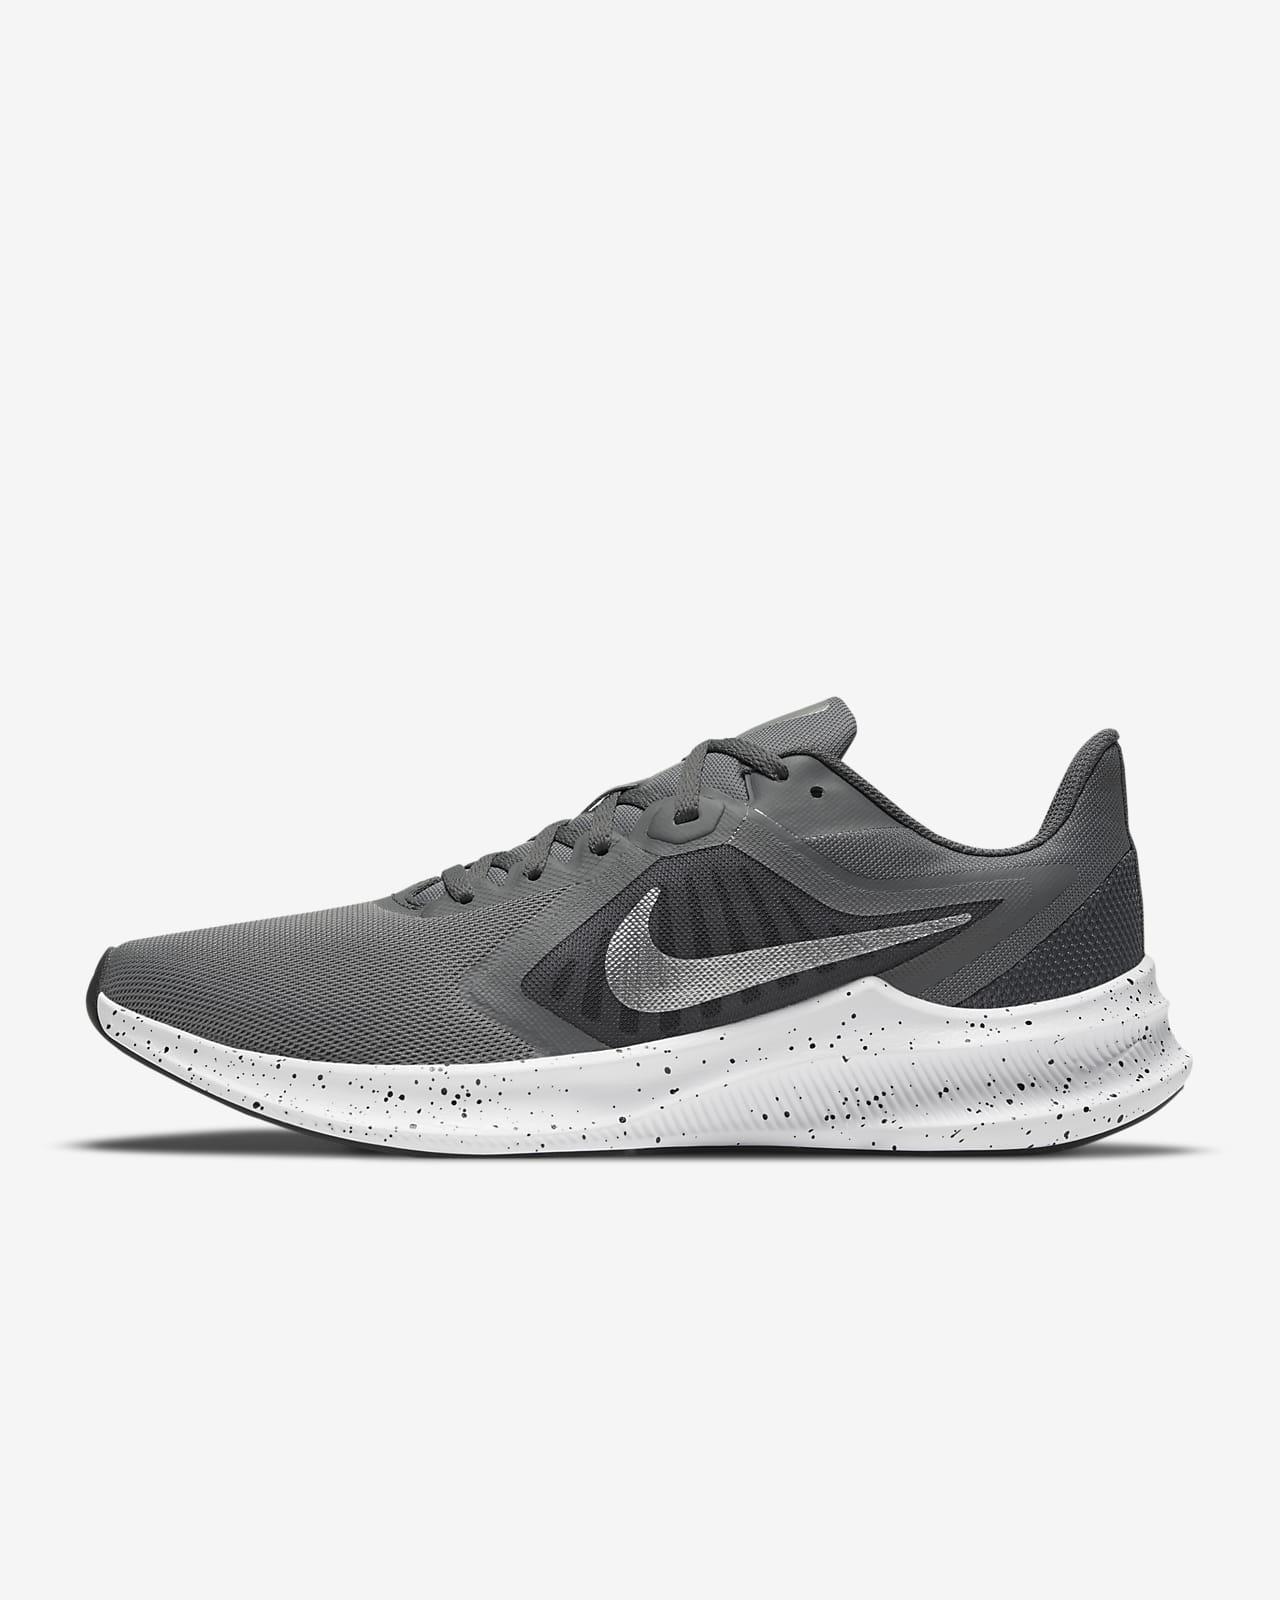 Nike Downshifter 10 Premium 跑鞋